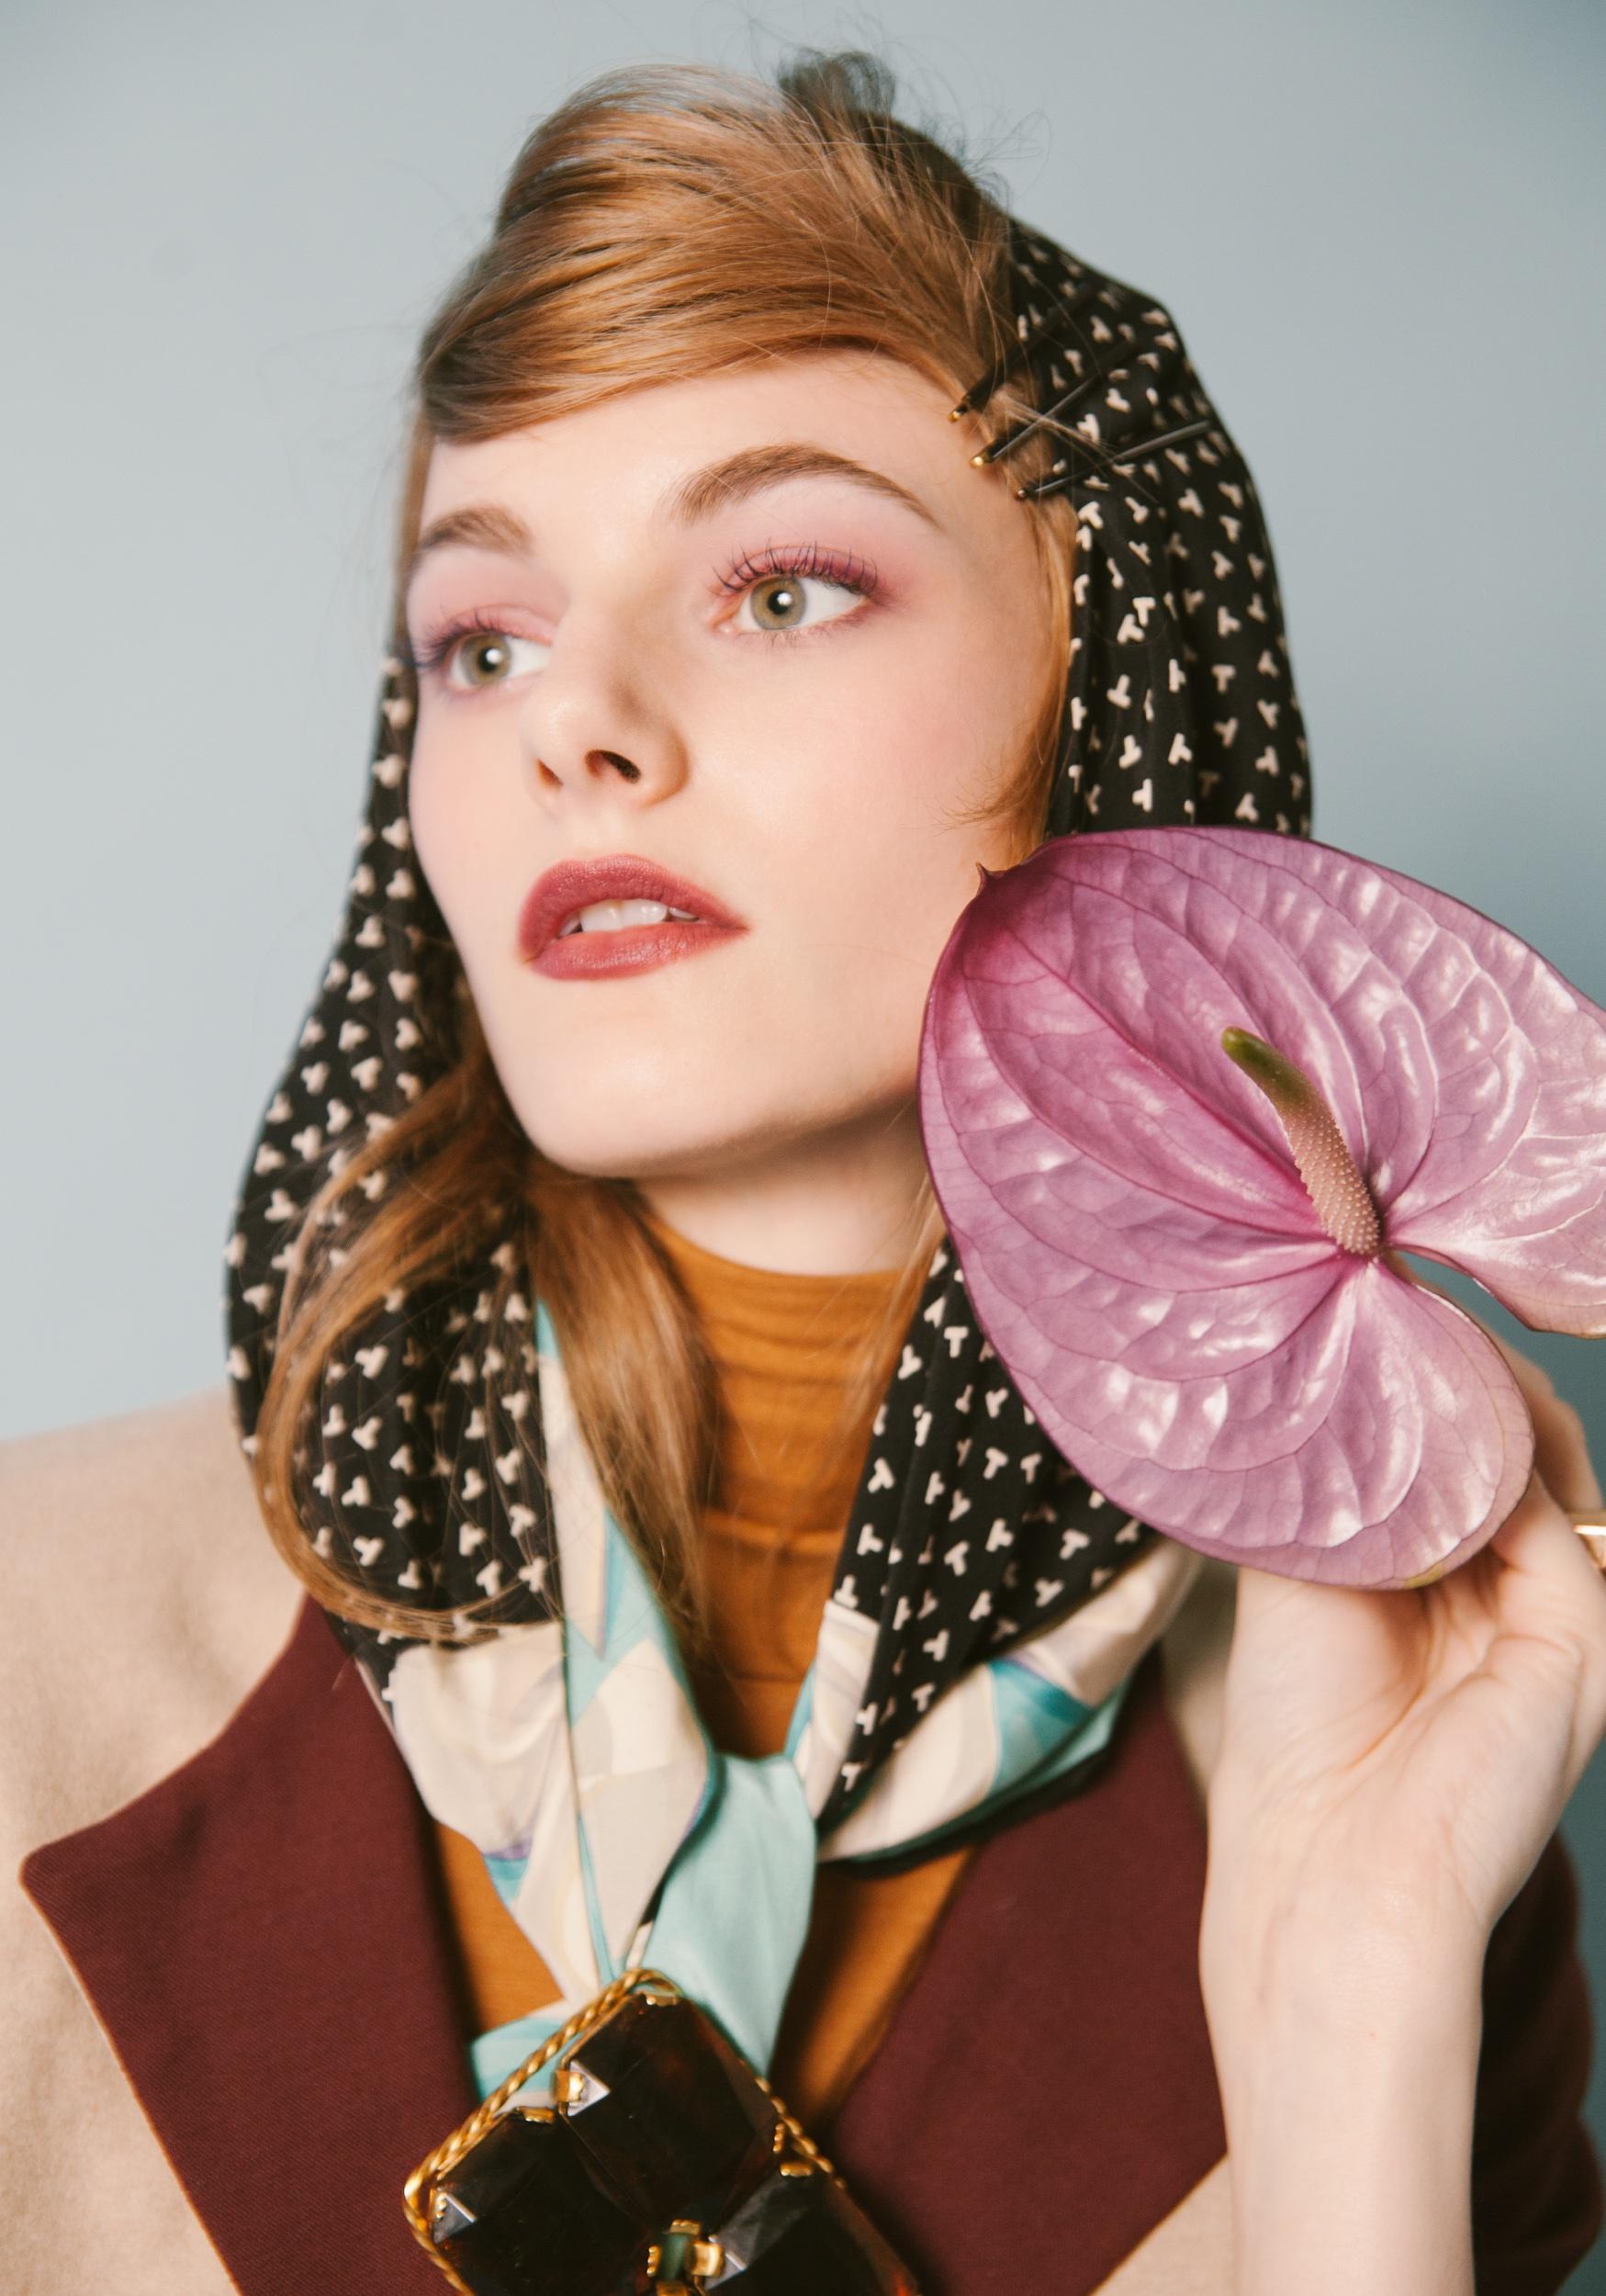 Jacket Elena Rudenko. Scarf Tiffany & Co